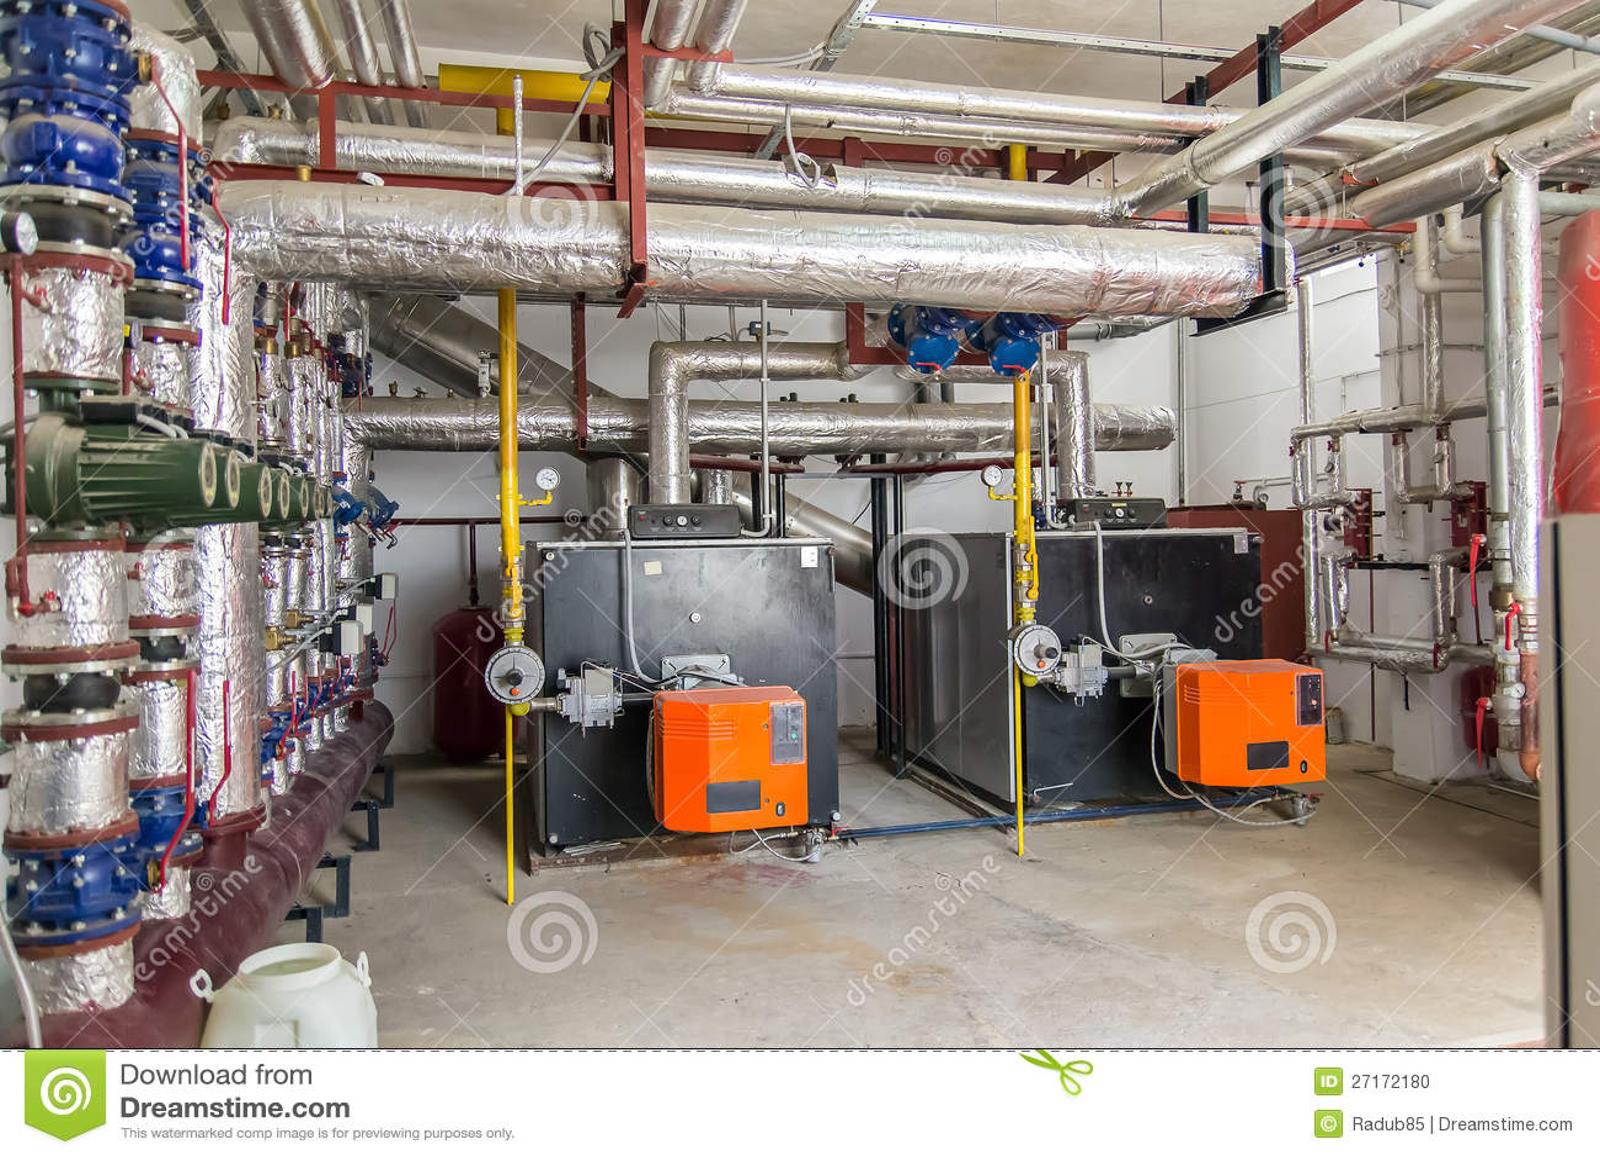 Generator room stock photo image 27172180 for Interior room design generator